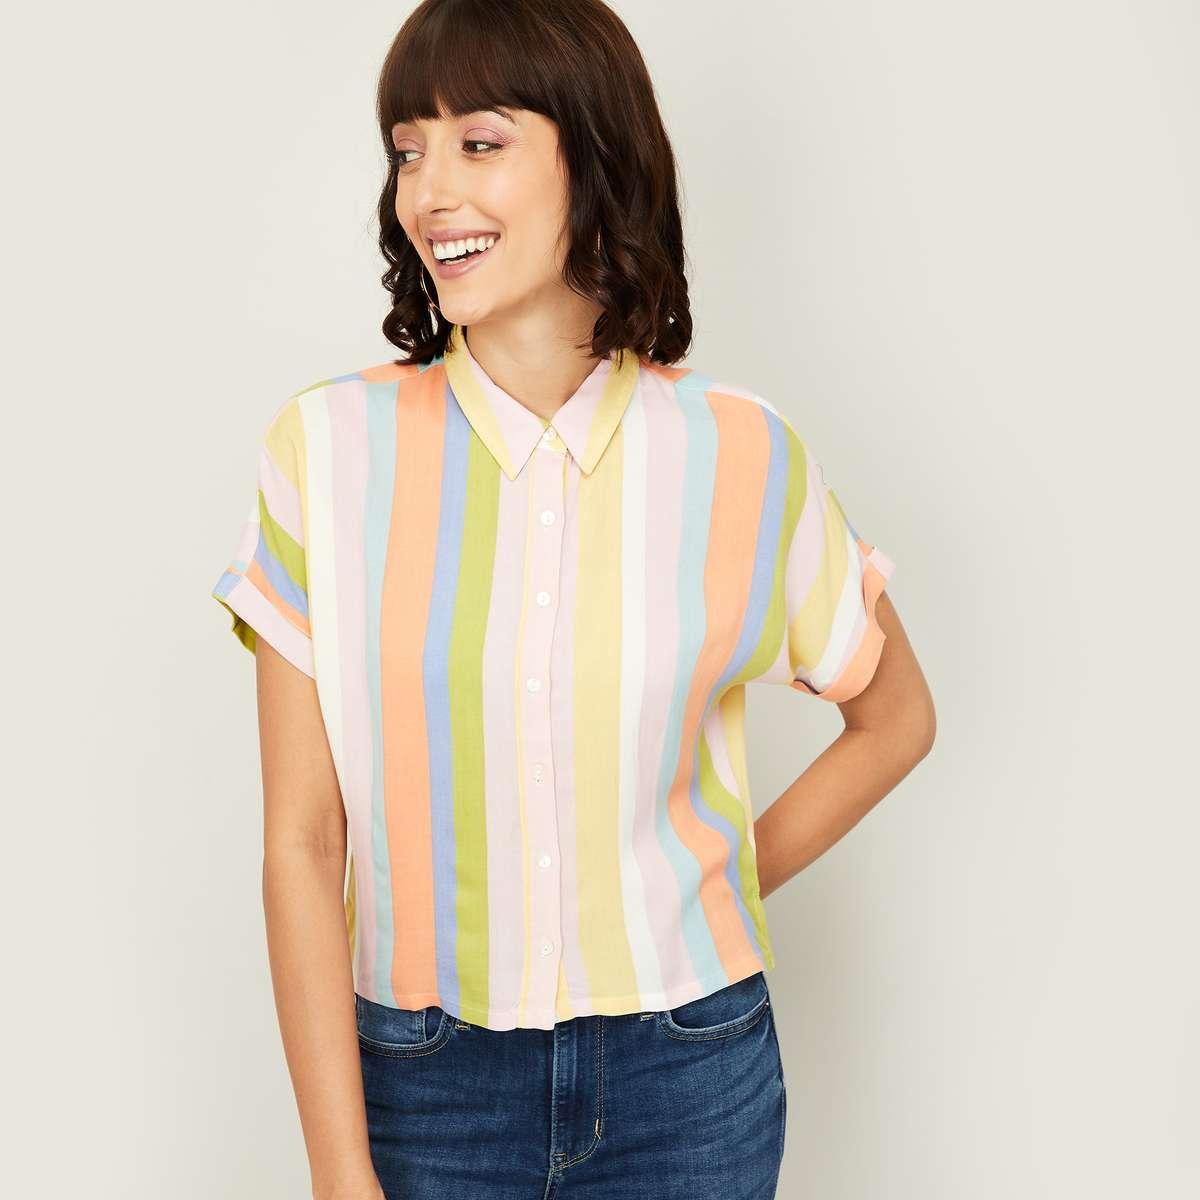 2.GINGER Women Striped Short Sleeves Casual Shirt